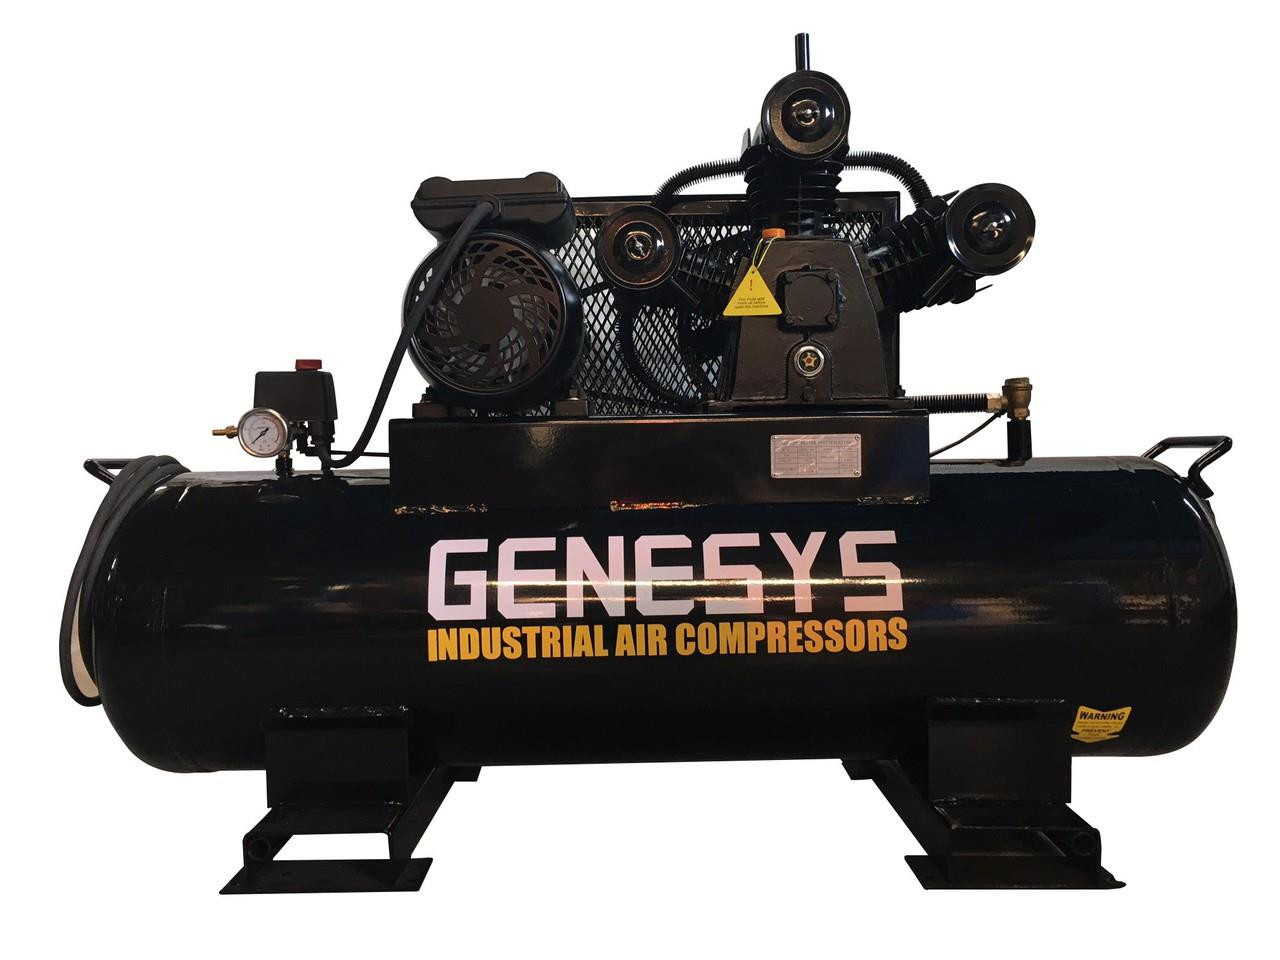 Compressor - 3 Cylinder Cast Iron Pump